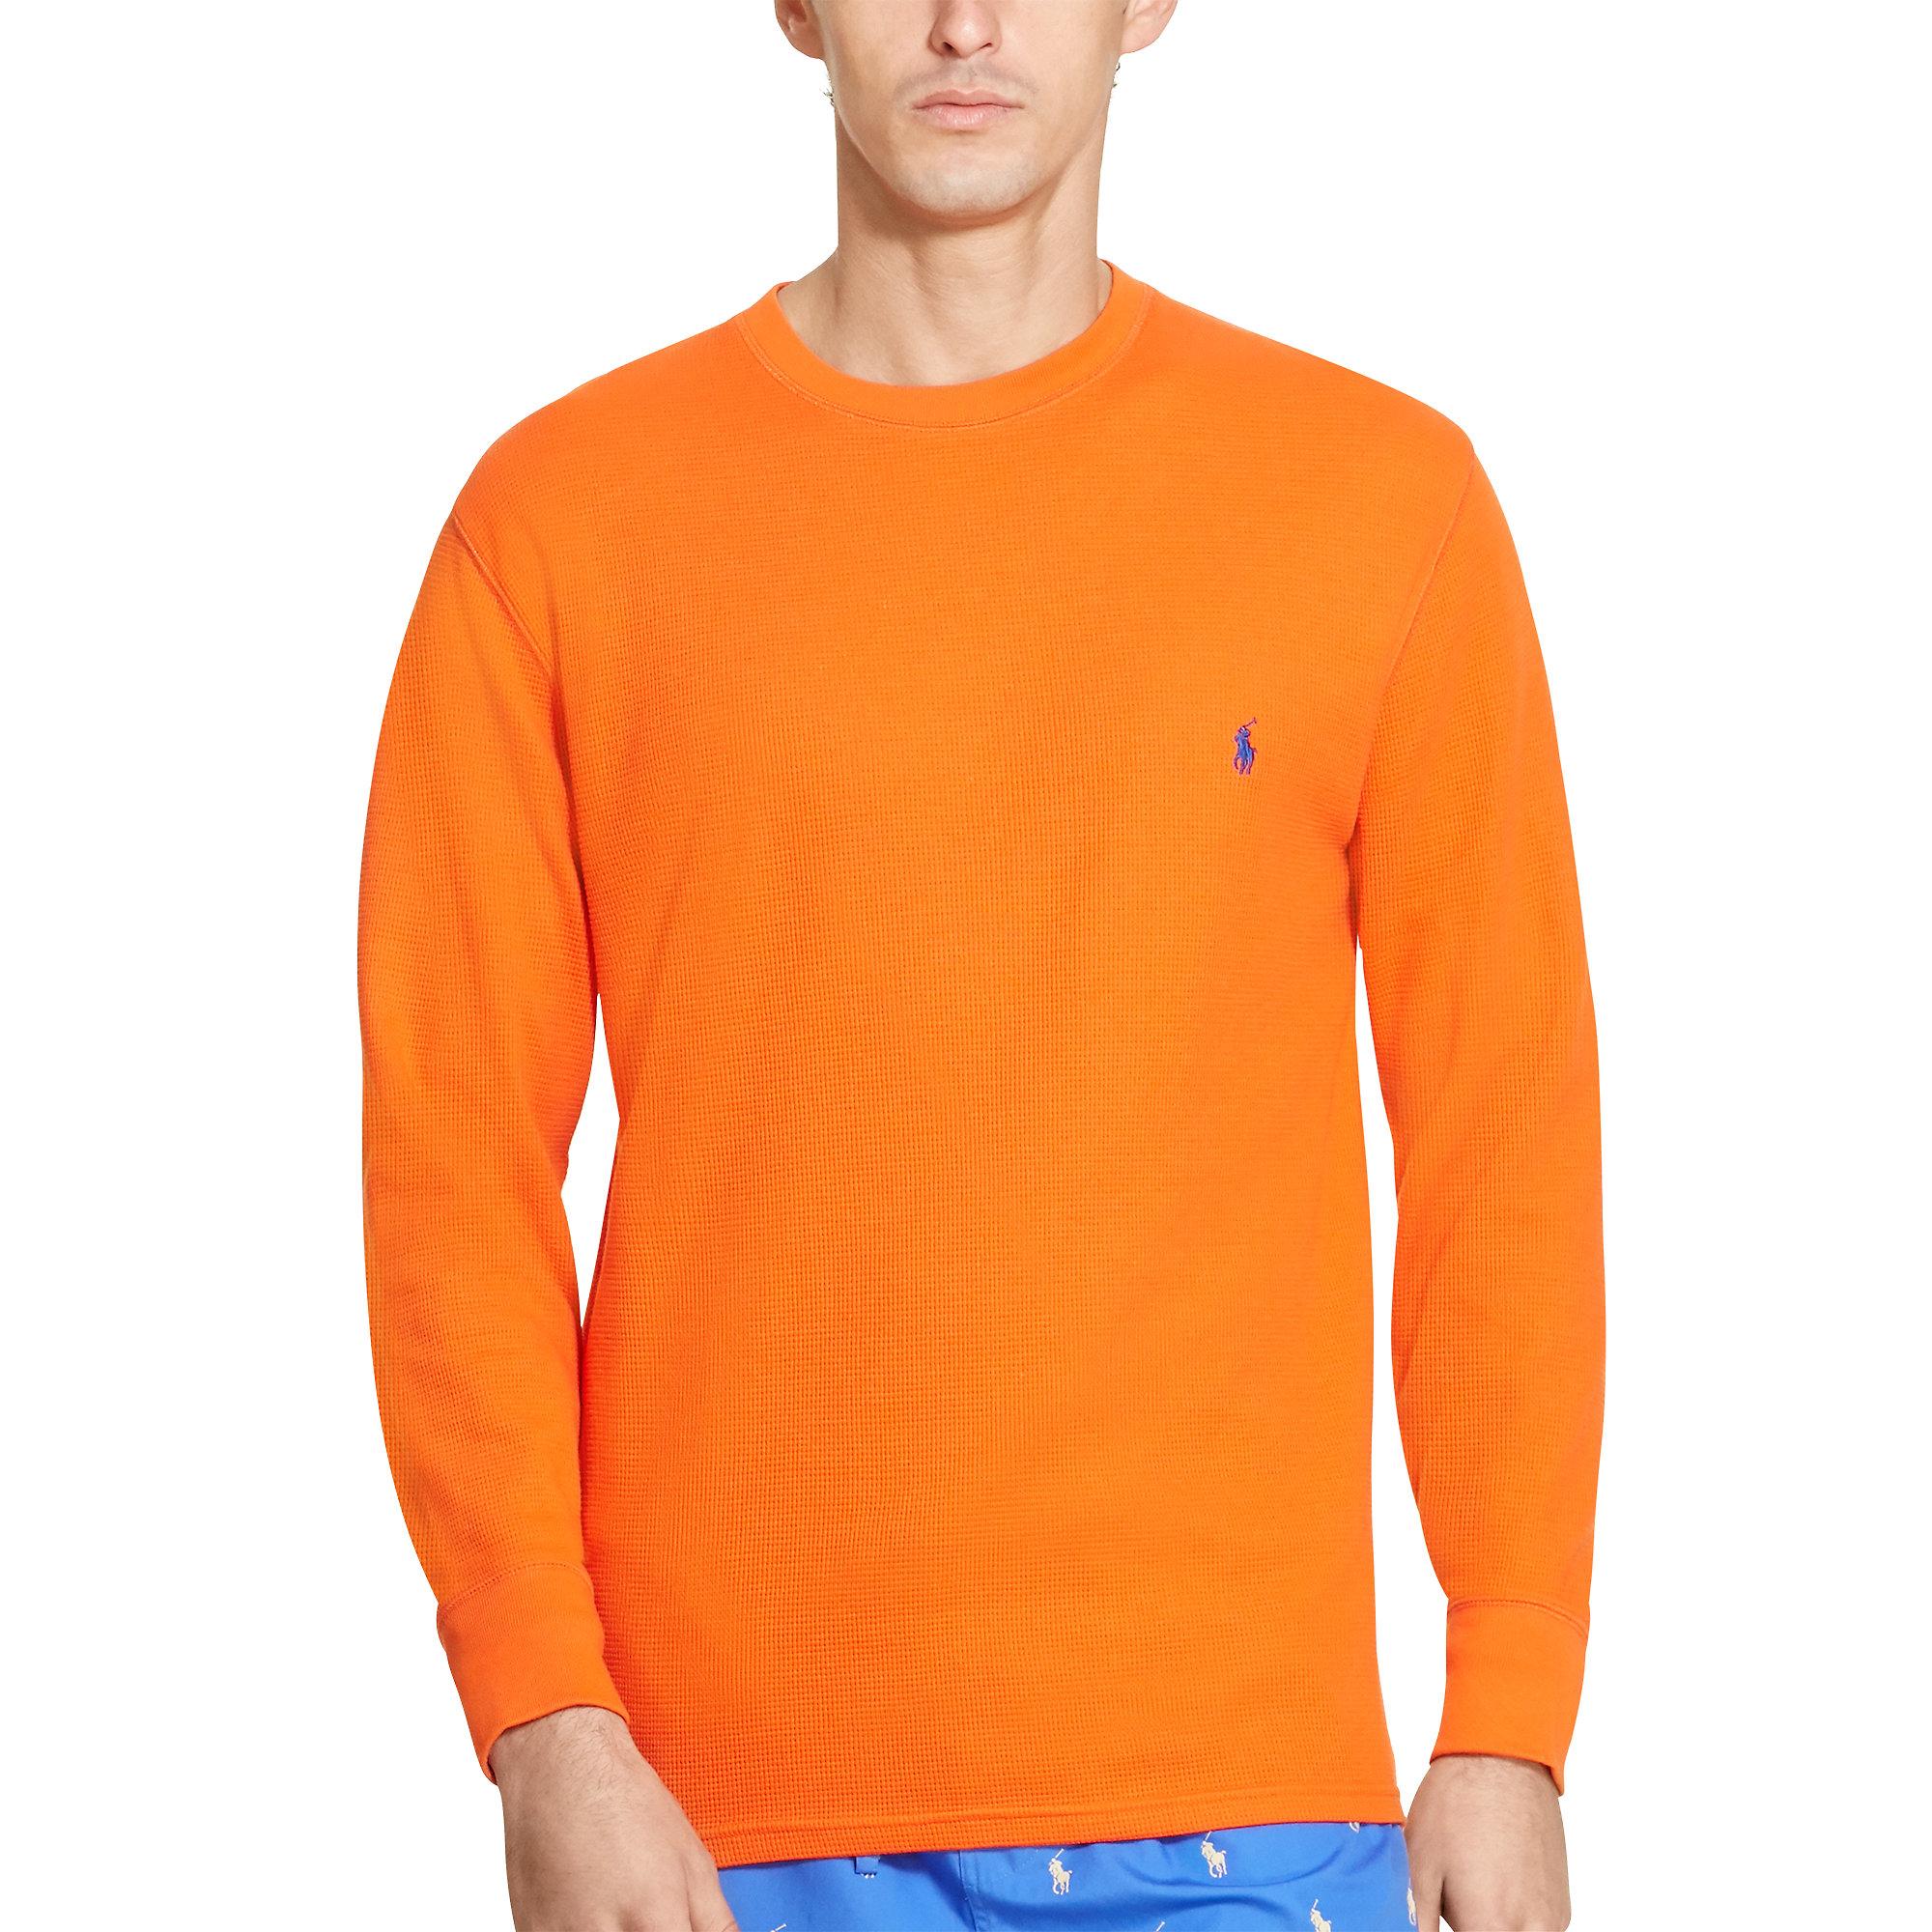 polo ralph lauren waffle knit cotton tee in orange for men lyst. Black Bedroom Furniture Sets. Home Design Ideas